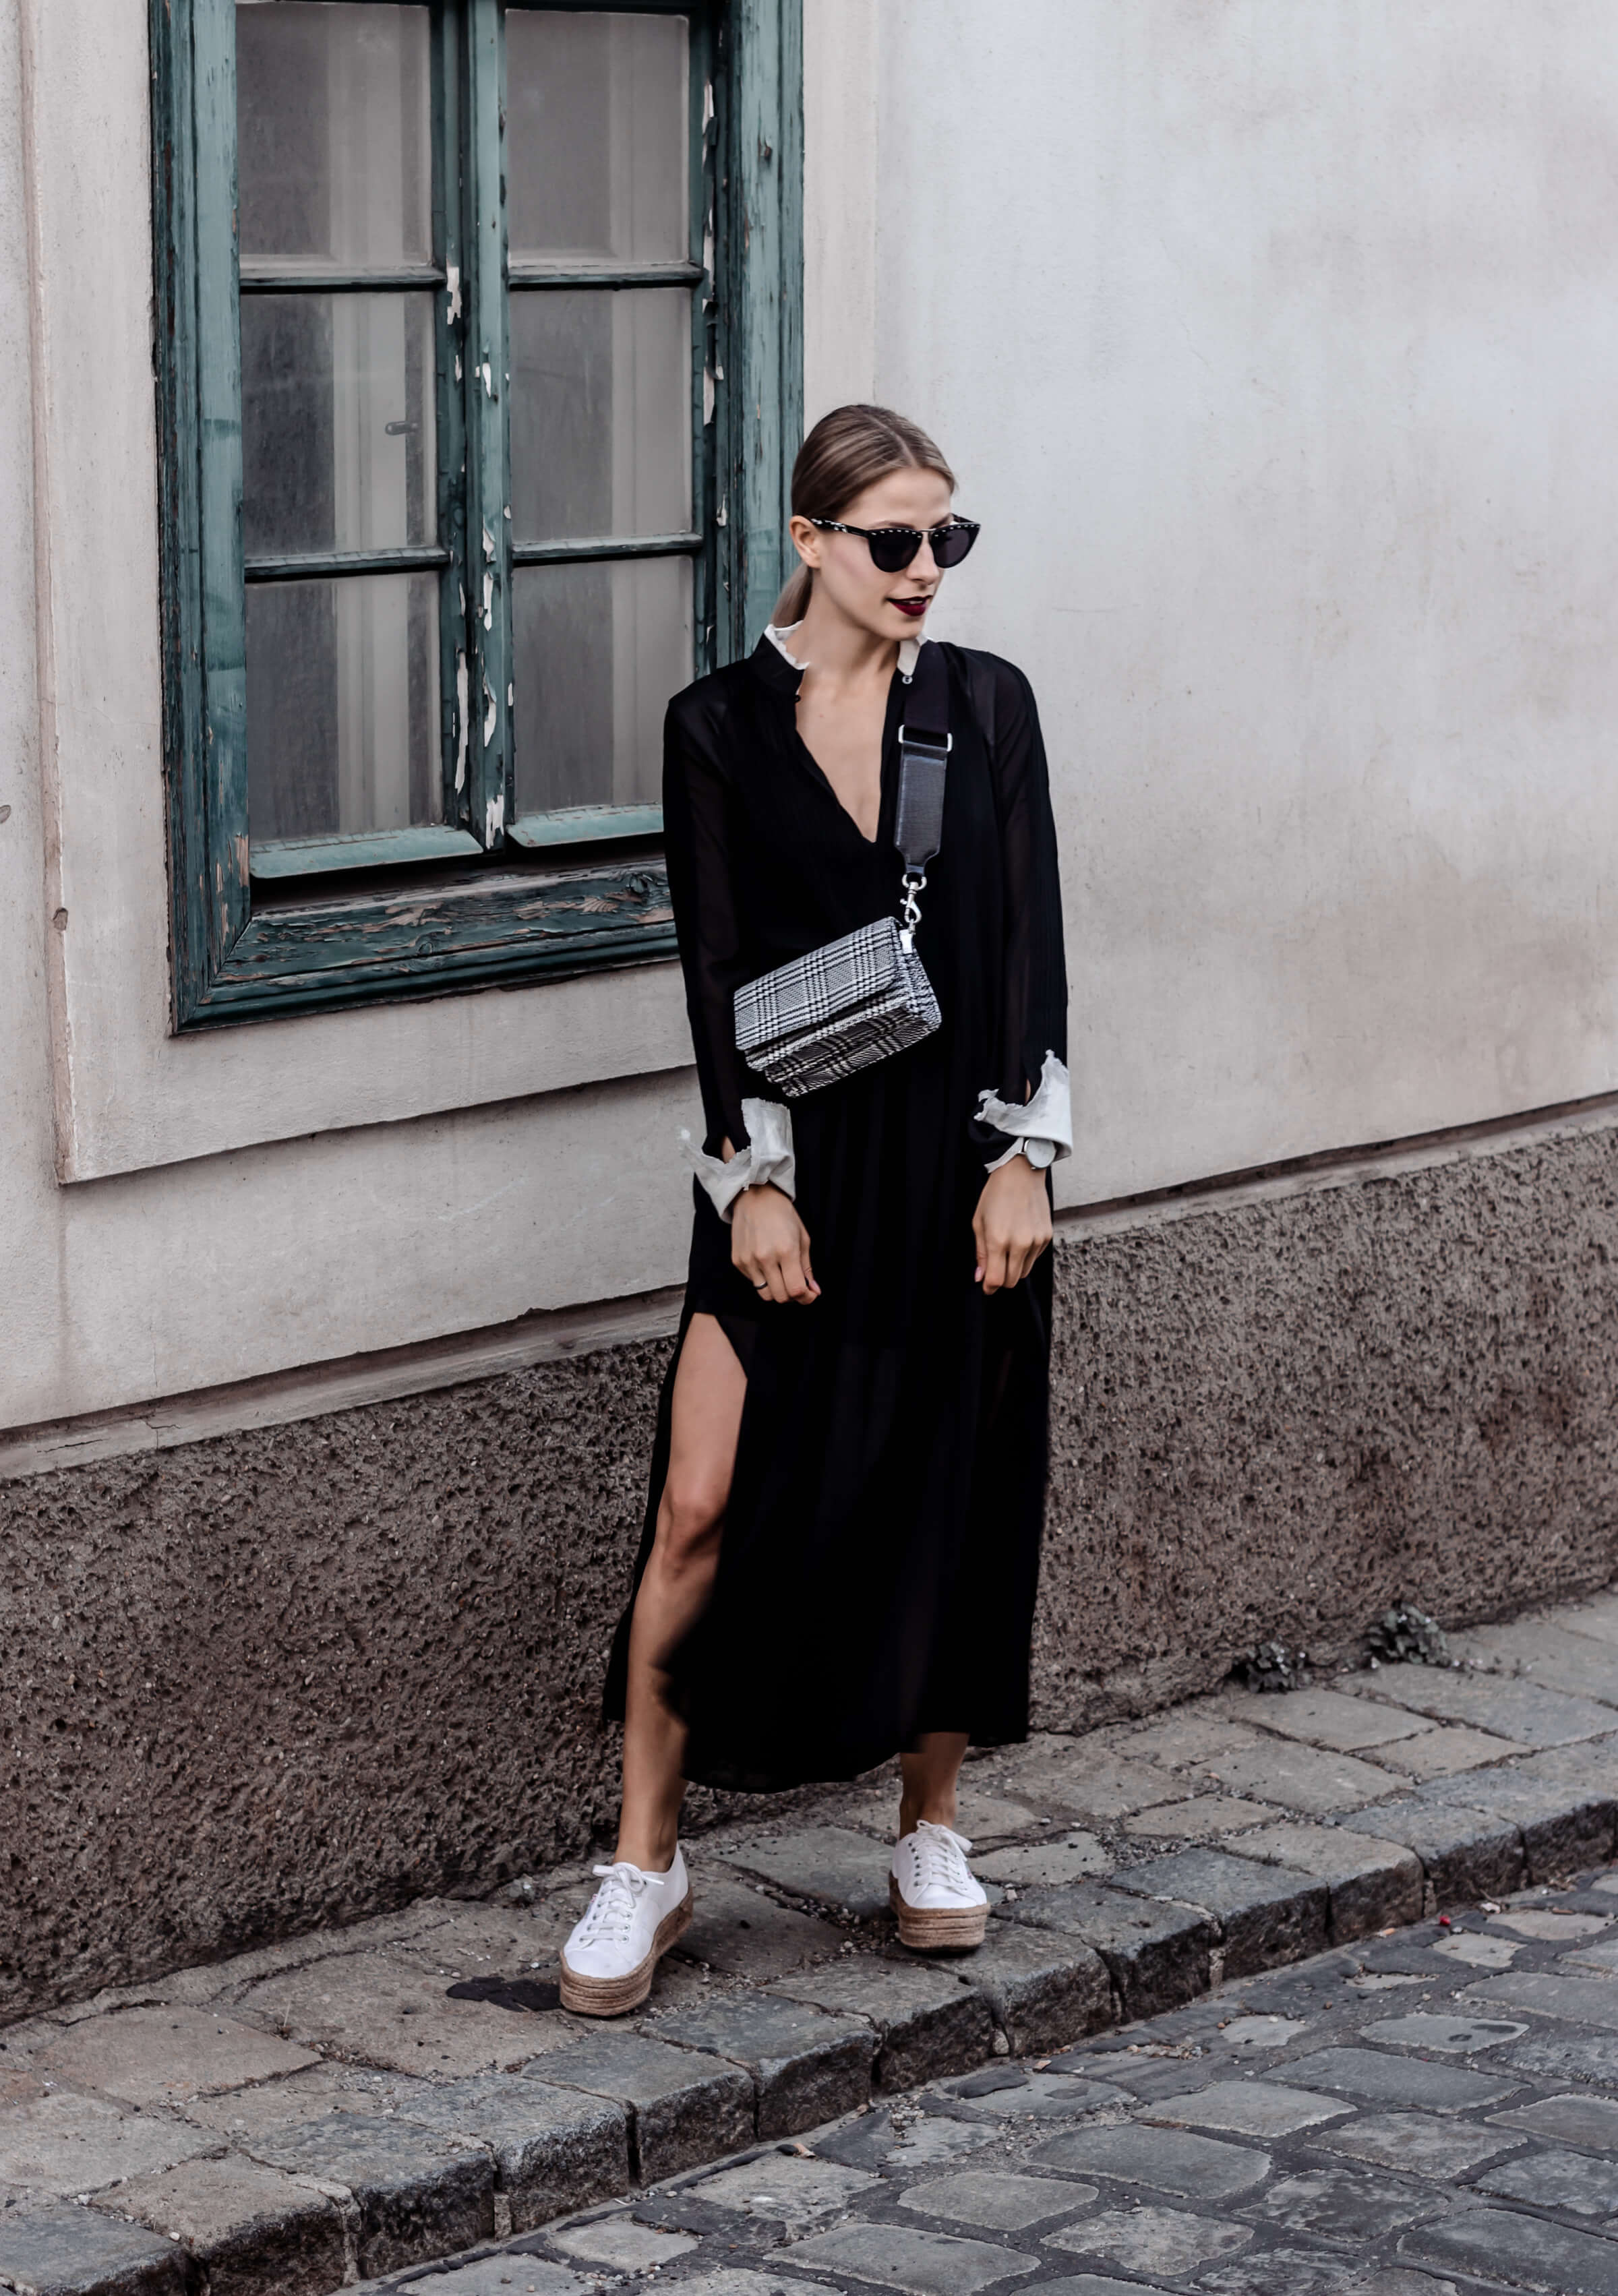 How to wear a long black dress